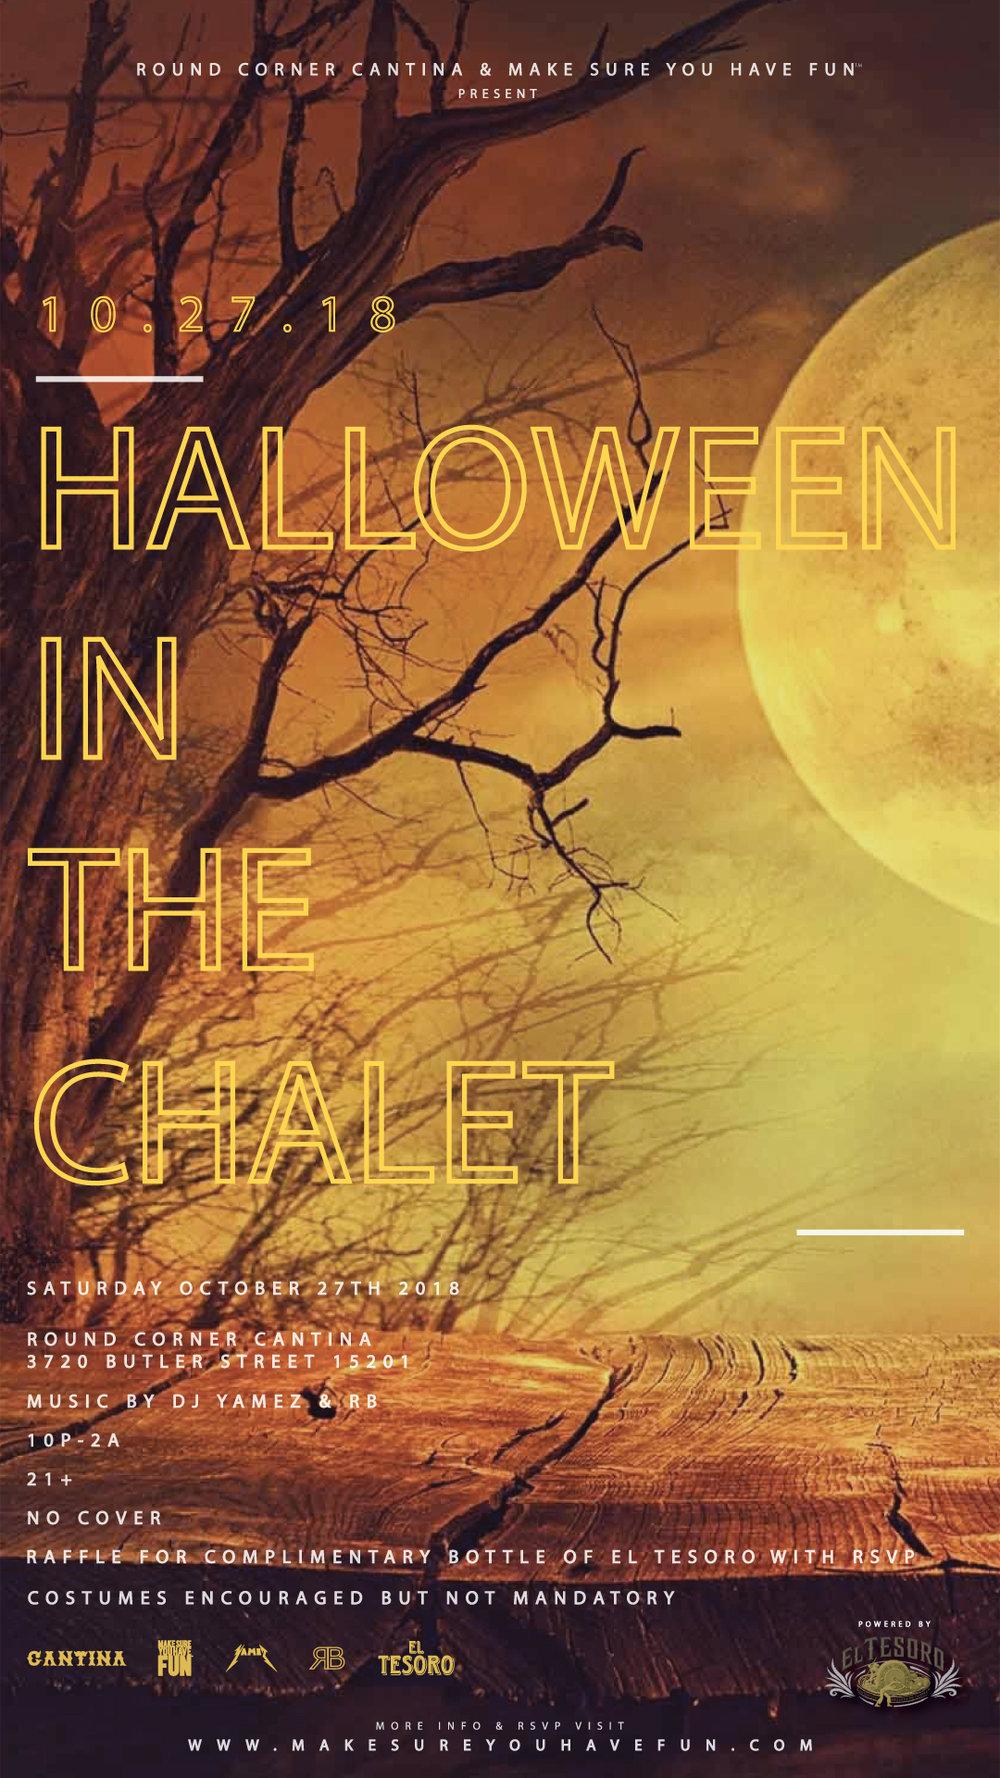 Halloween-At-Cantina-IG-Story-Flyer.jpg